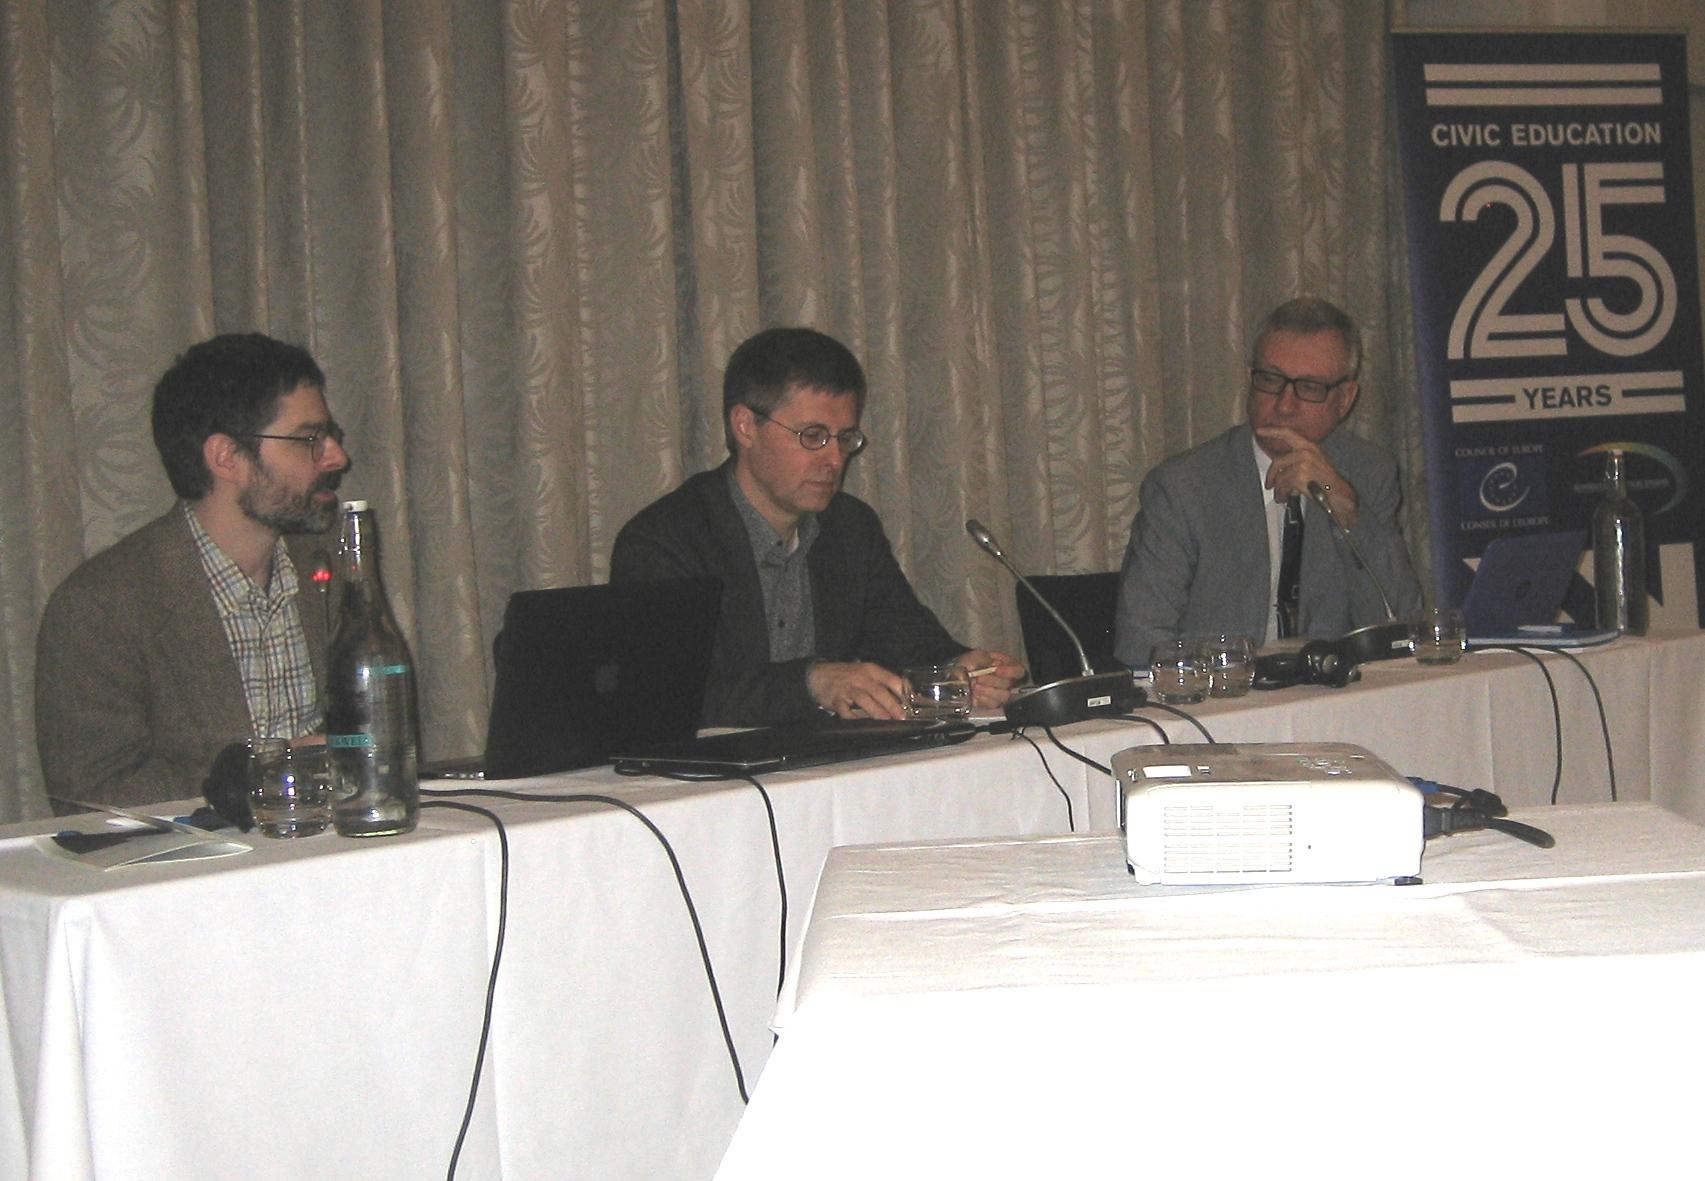 Epplee Niklolay and Gorin Dmitry and Zakharov Andrey